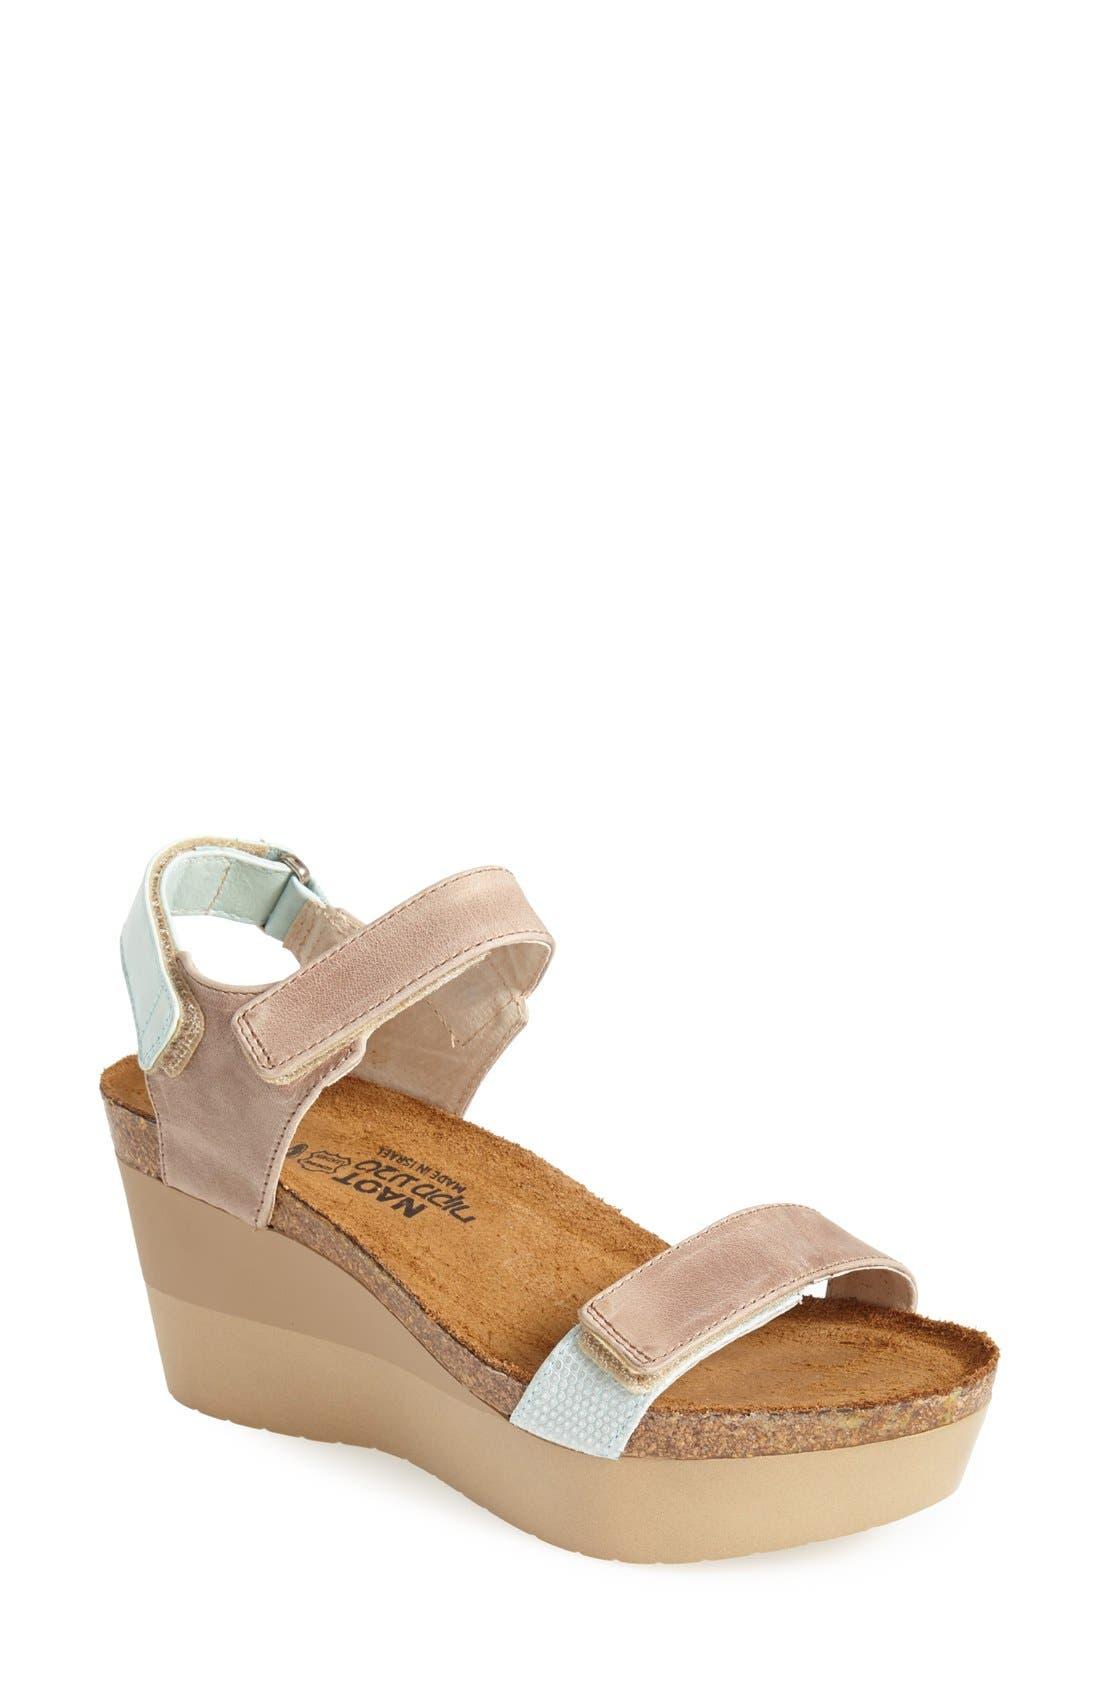 'Miracle' Sandal,                         Main,                         color, Beige